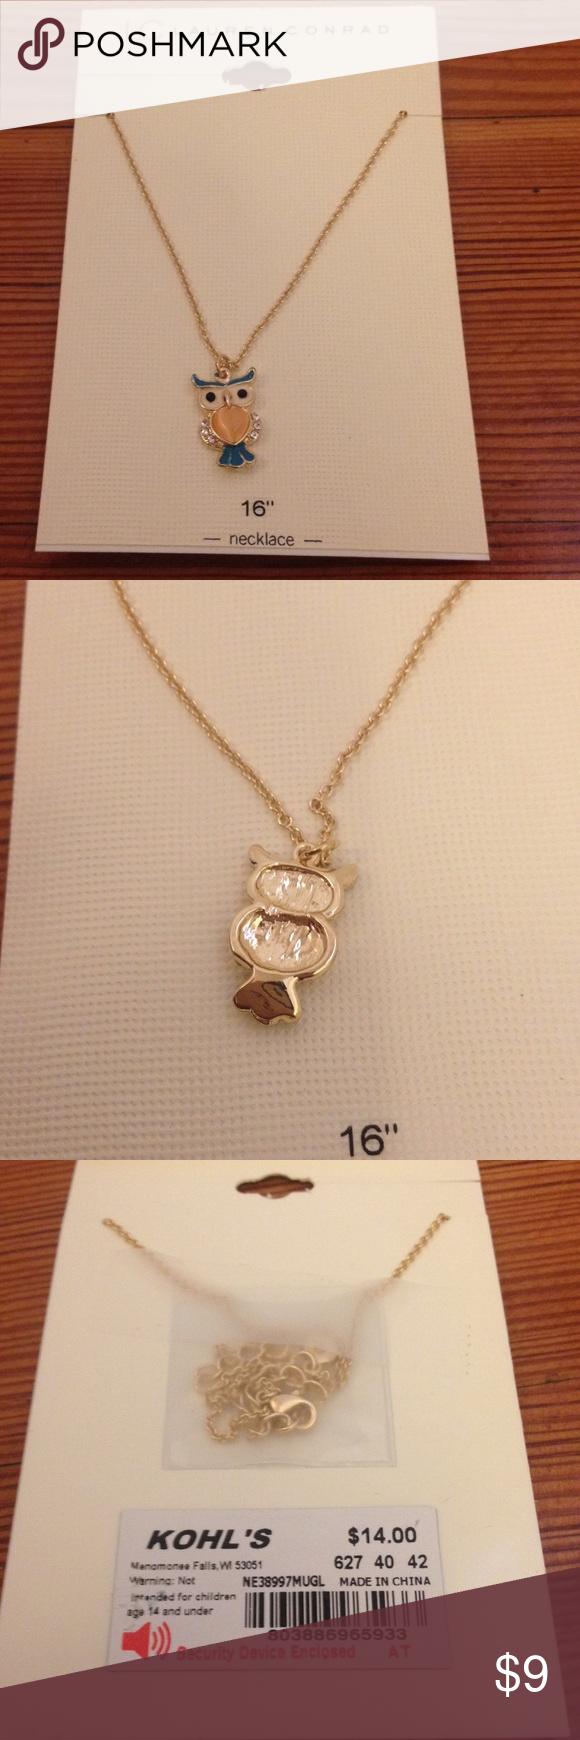 "NWT LC Lauren Conrad 16"" Gold Tone Owl Necklace NWT LC Lauren Conrad 16"" Gold Tone Owl Necklace LC Lauren Conrad Jewelry Necklaces"